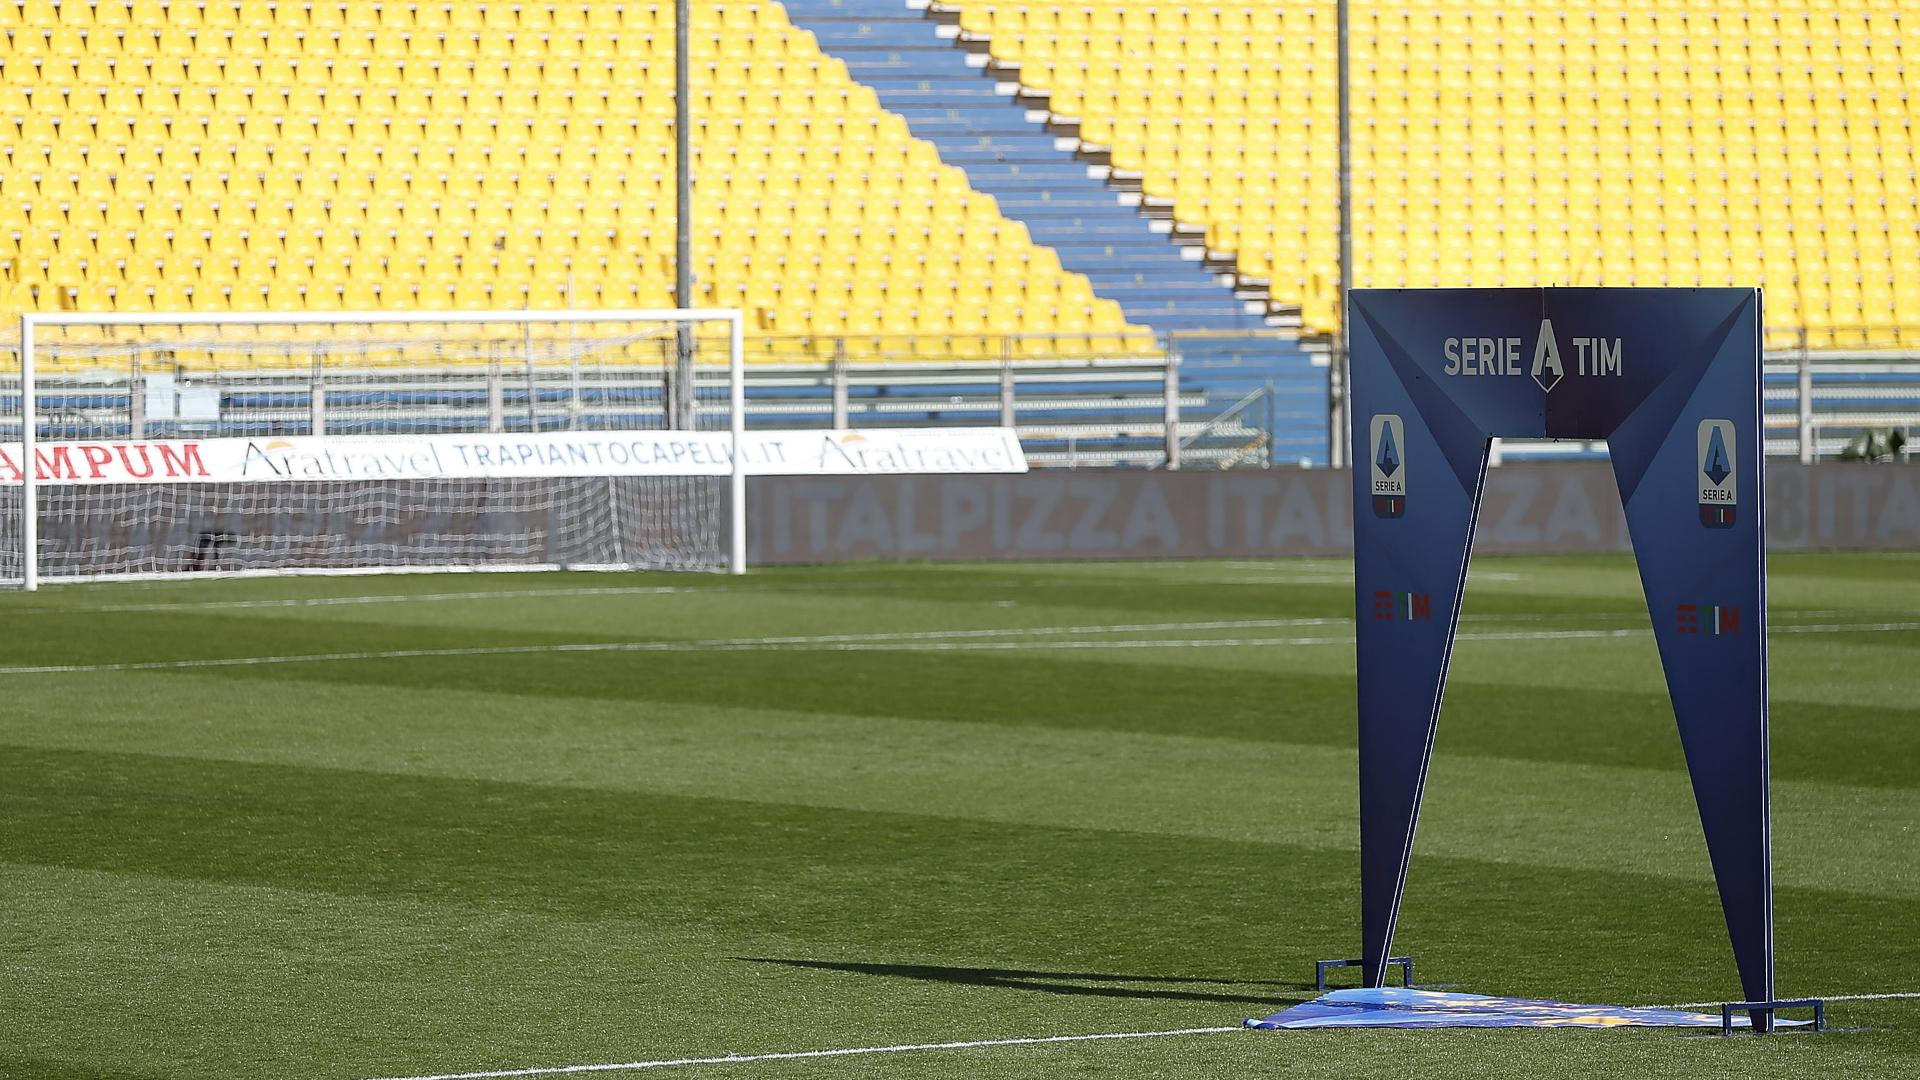 Coronavirus, sospese Ligue 1 e Premier League. La Bundesliga si fermerà lunedì